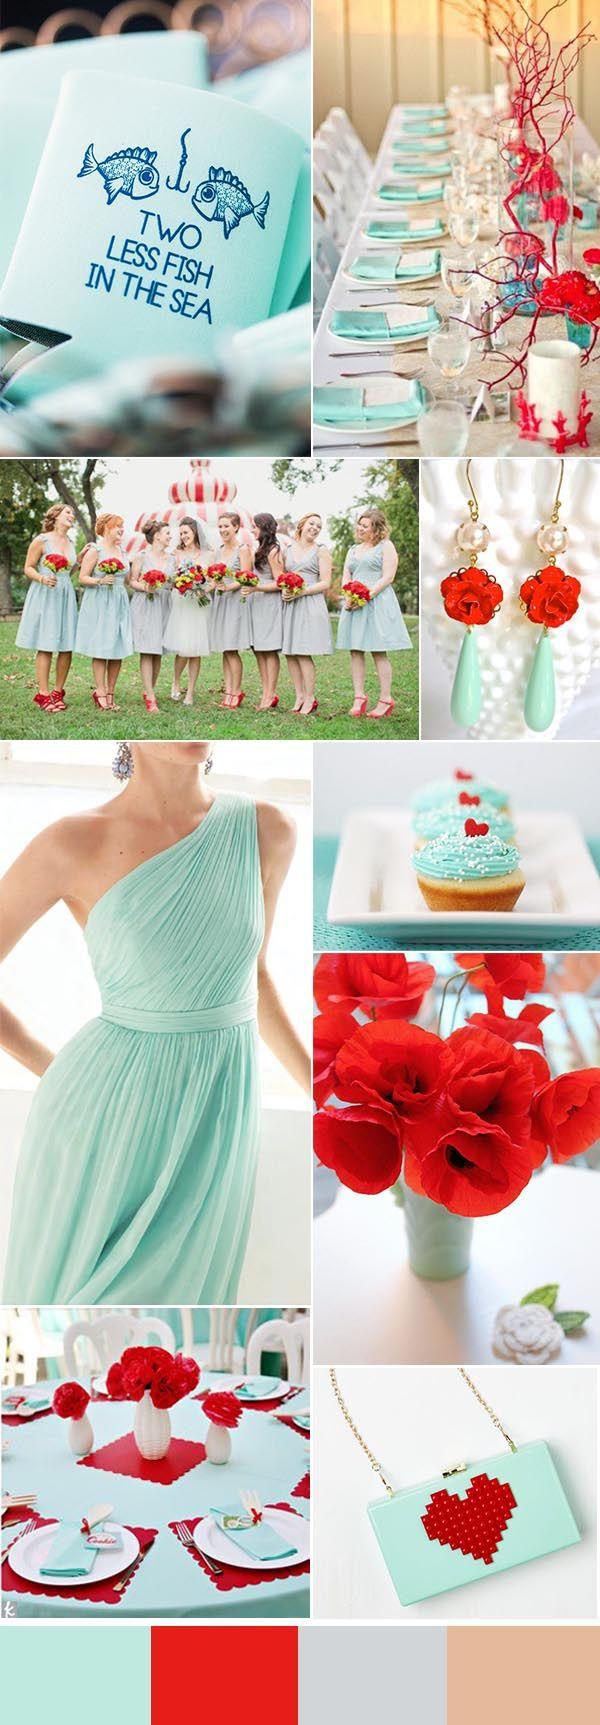 best matrimonio images on Pinterest  Weddings Wedding ideas